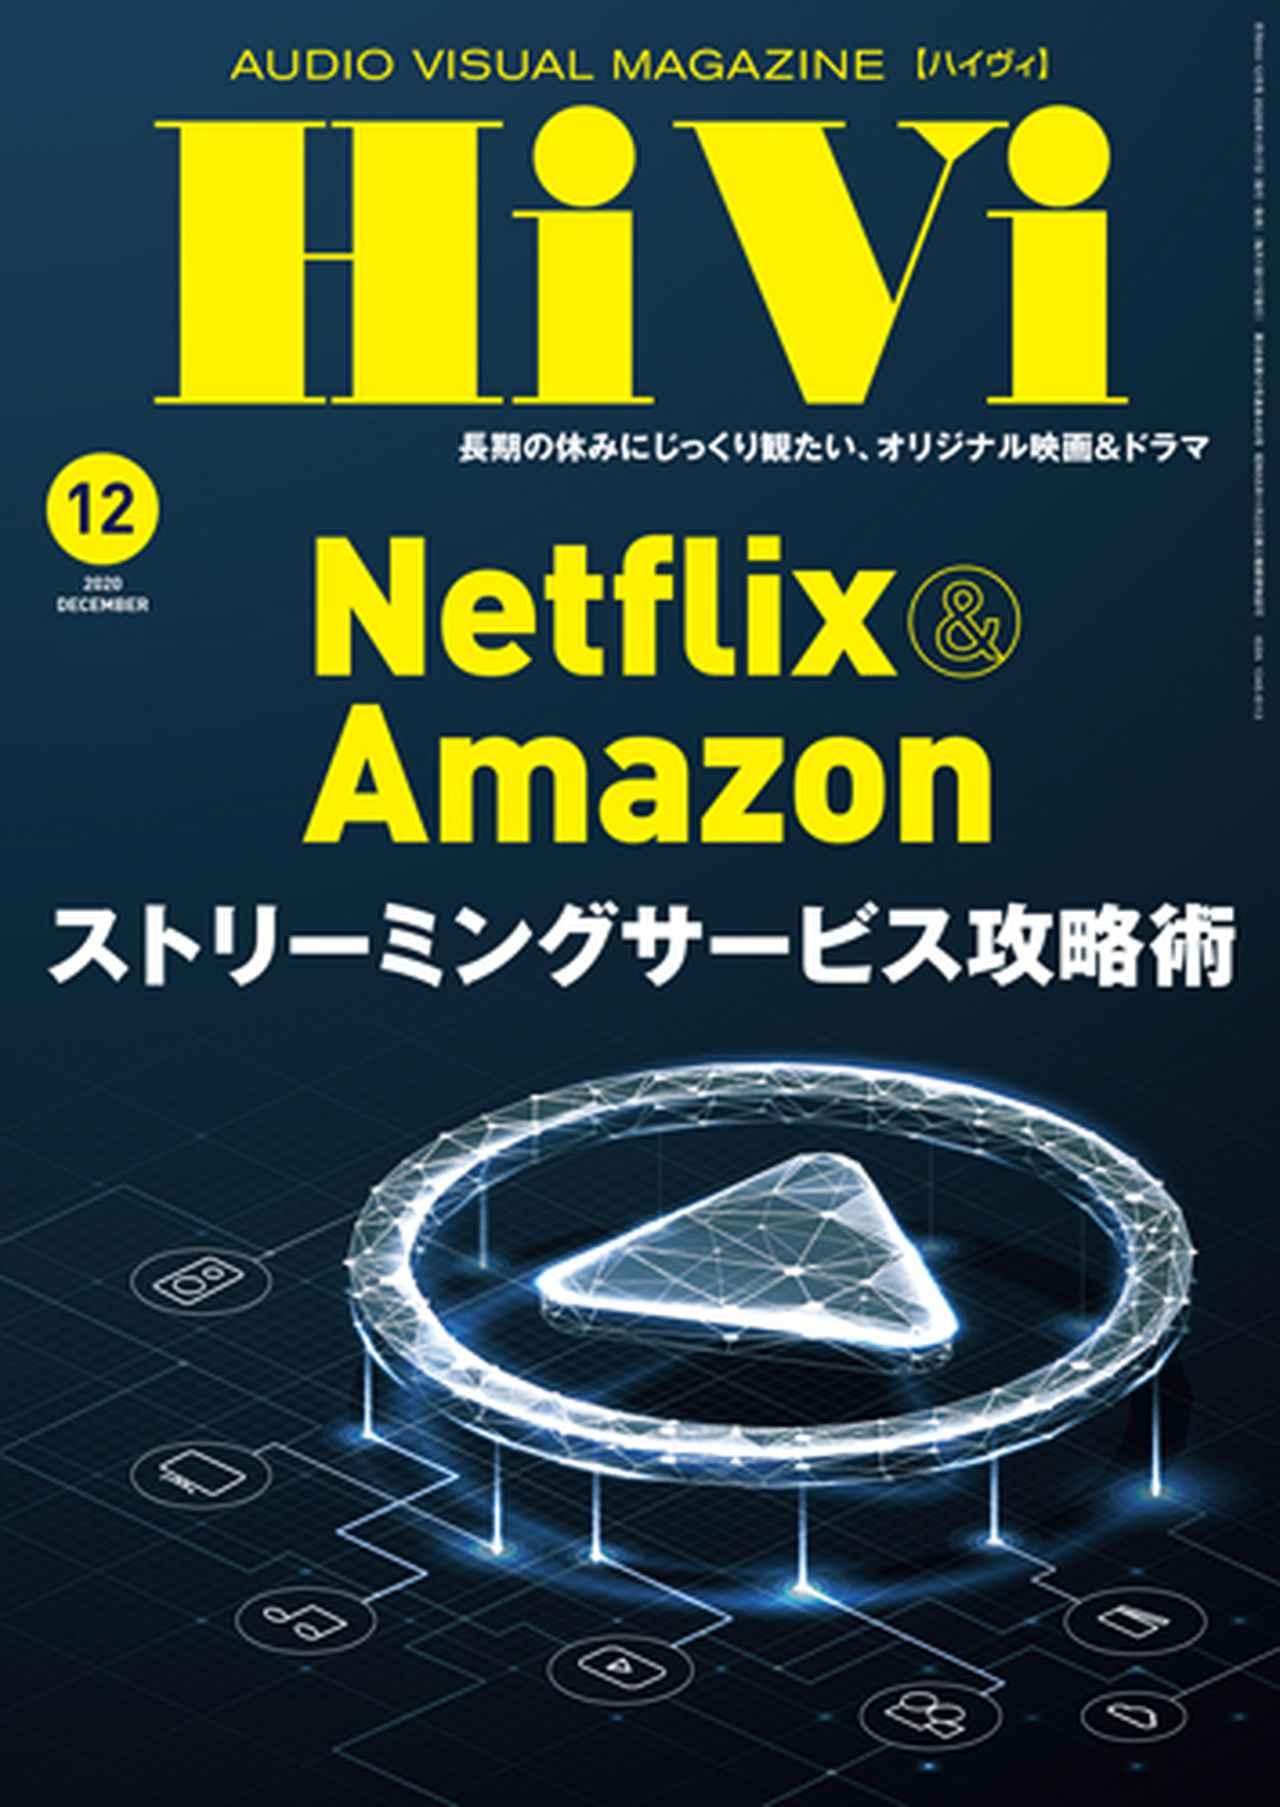 画像: HiVi 2020年12月号